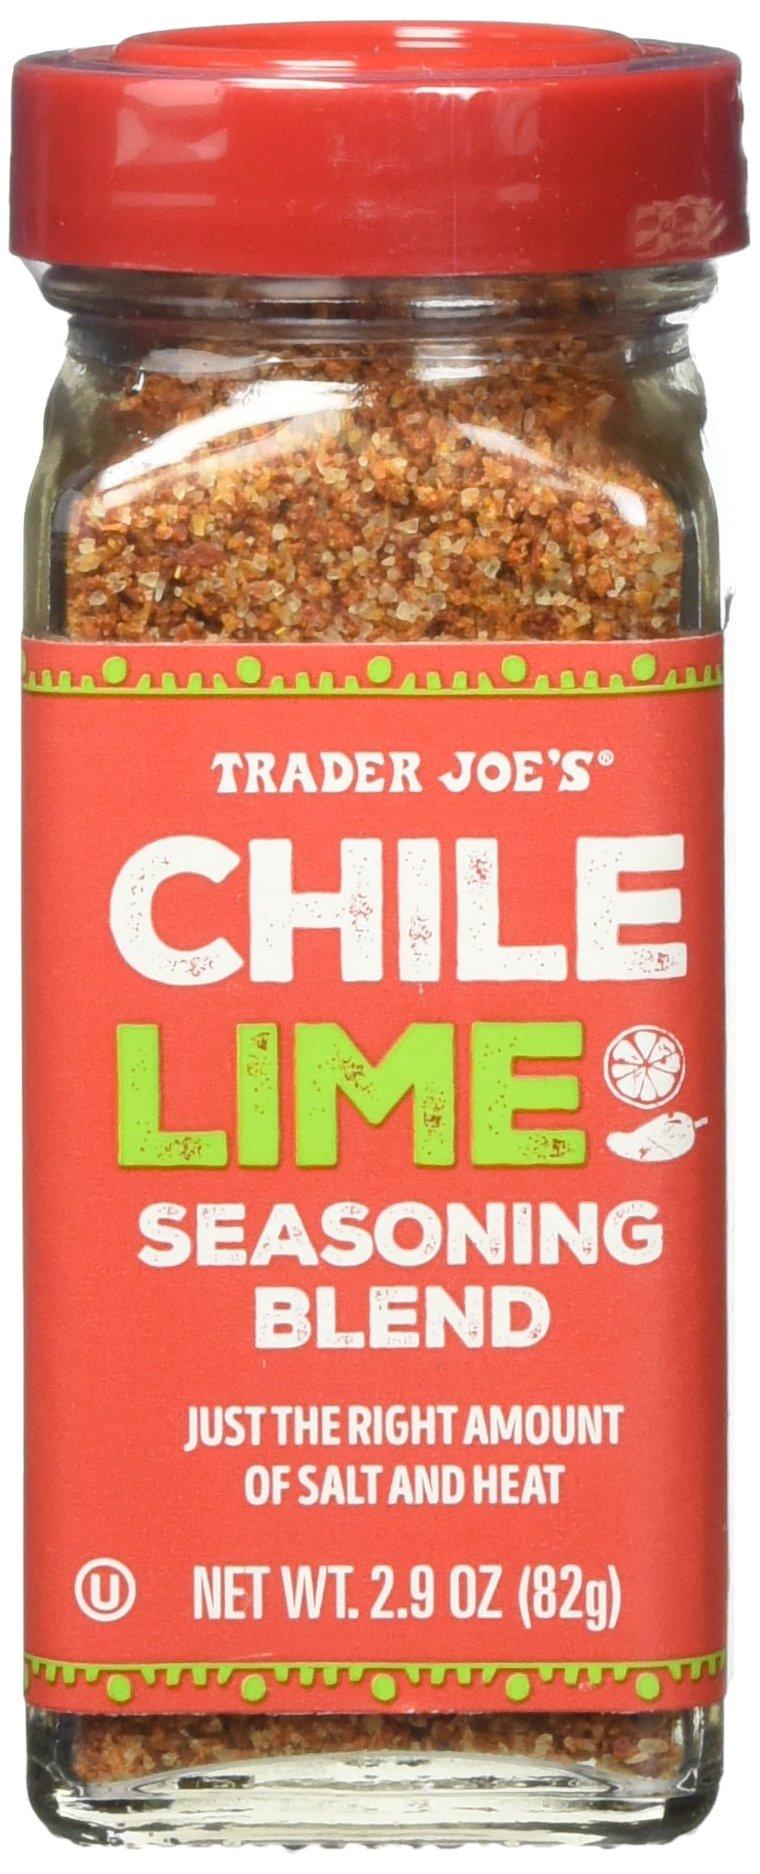 Trader Joe's Chile Lime Seasoning Blend, 2.9 oz